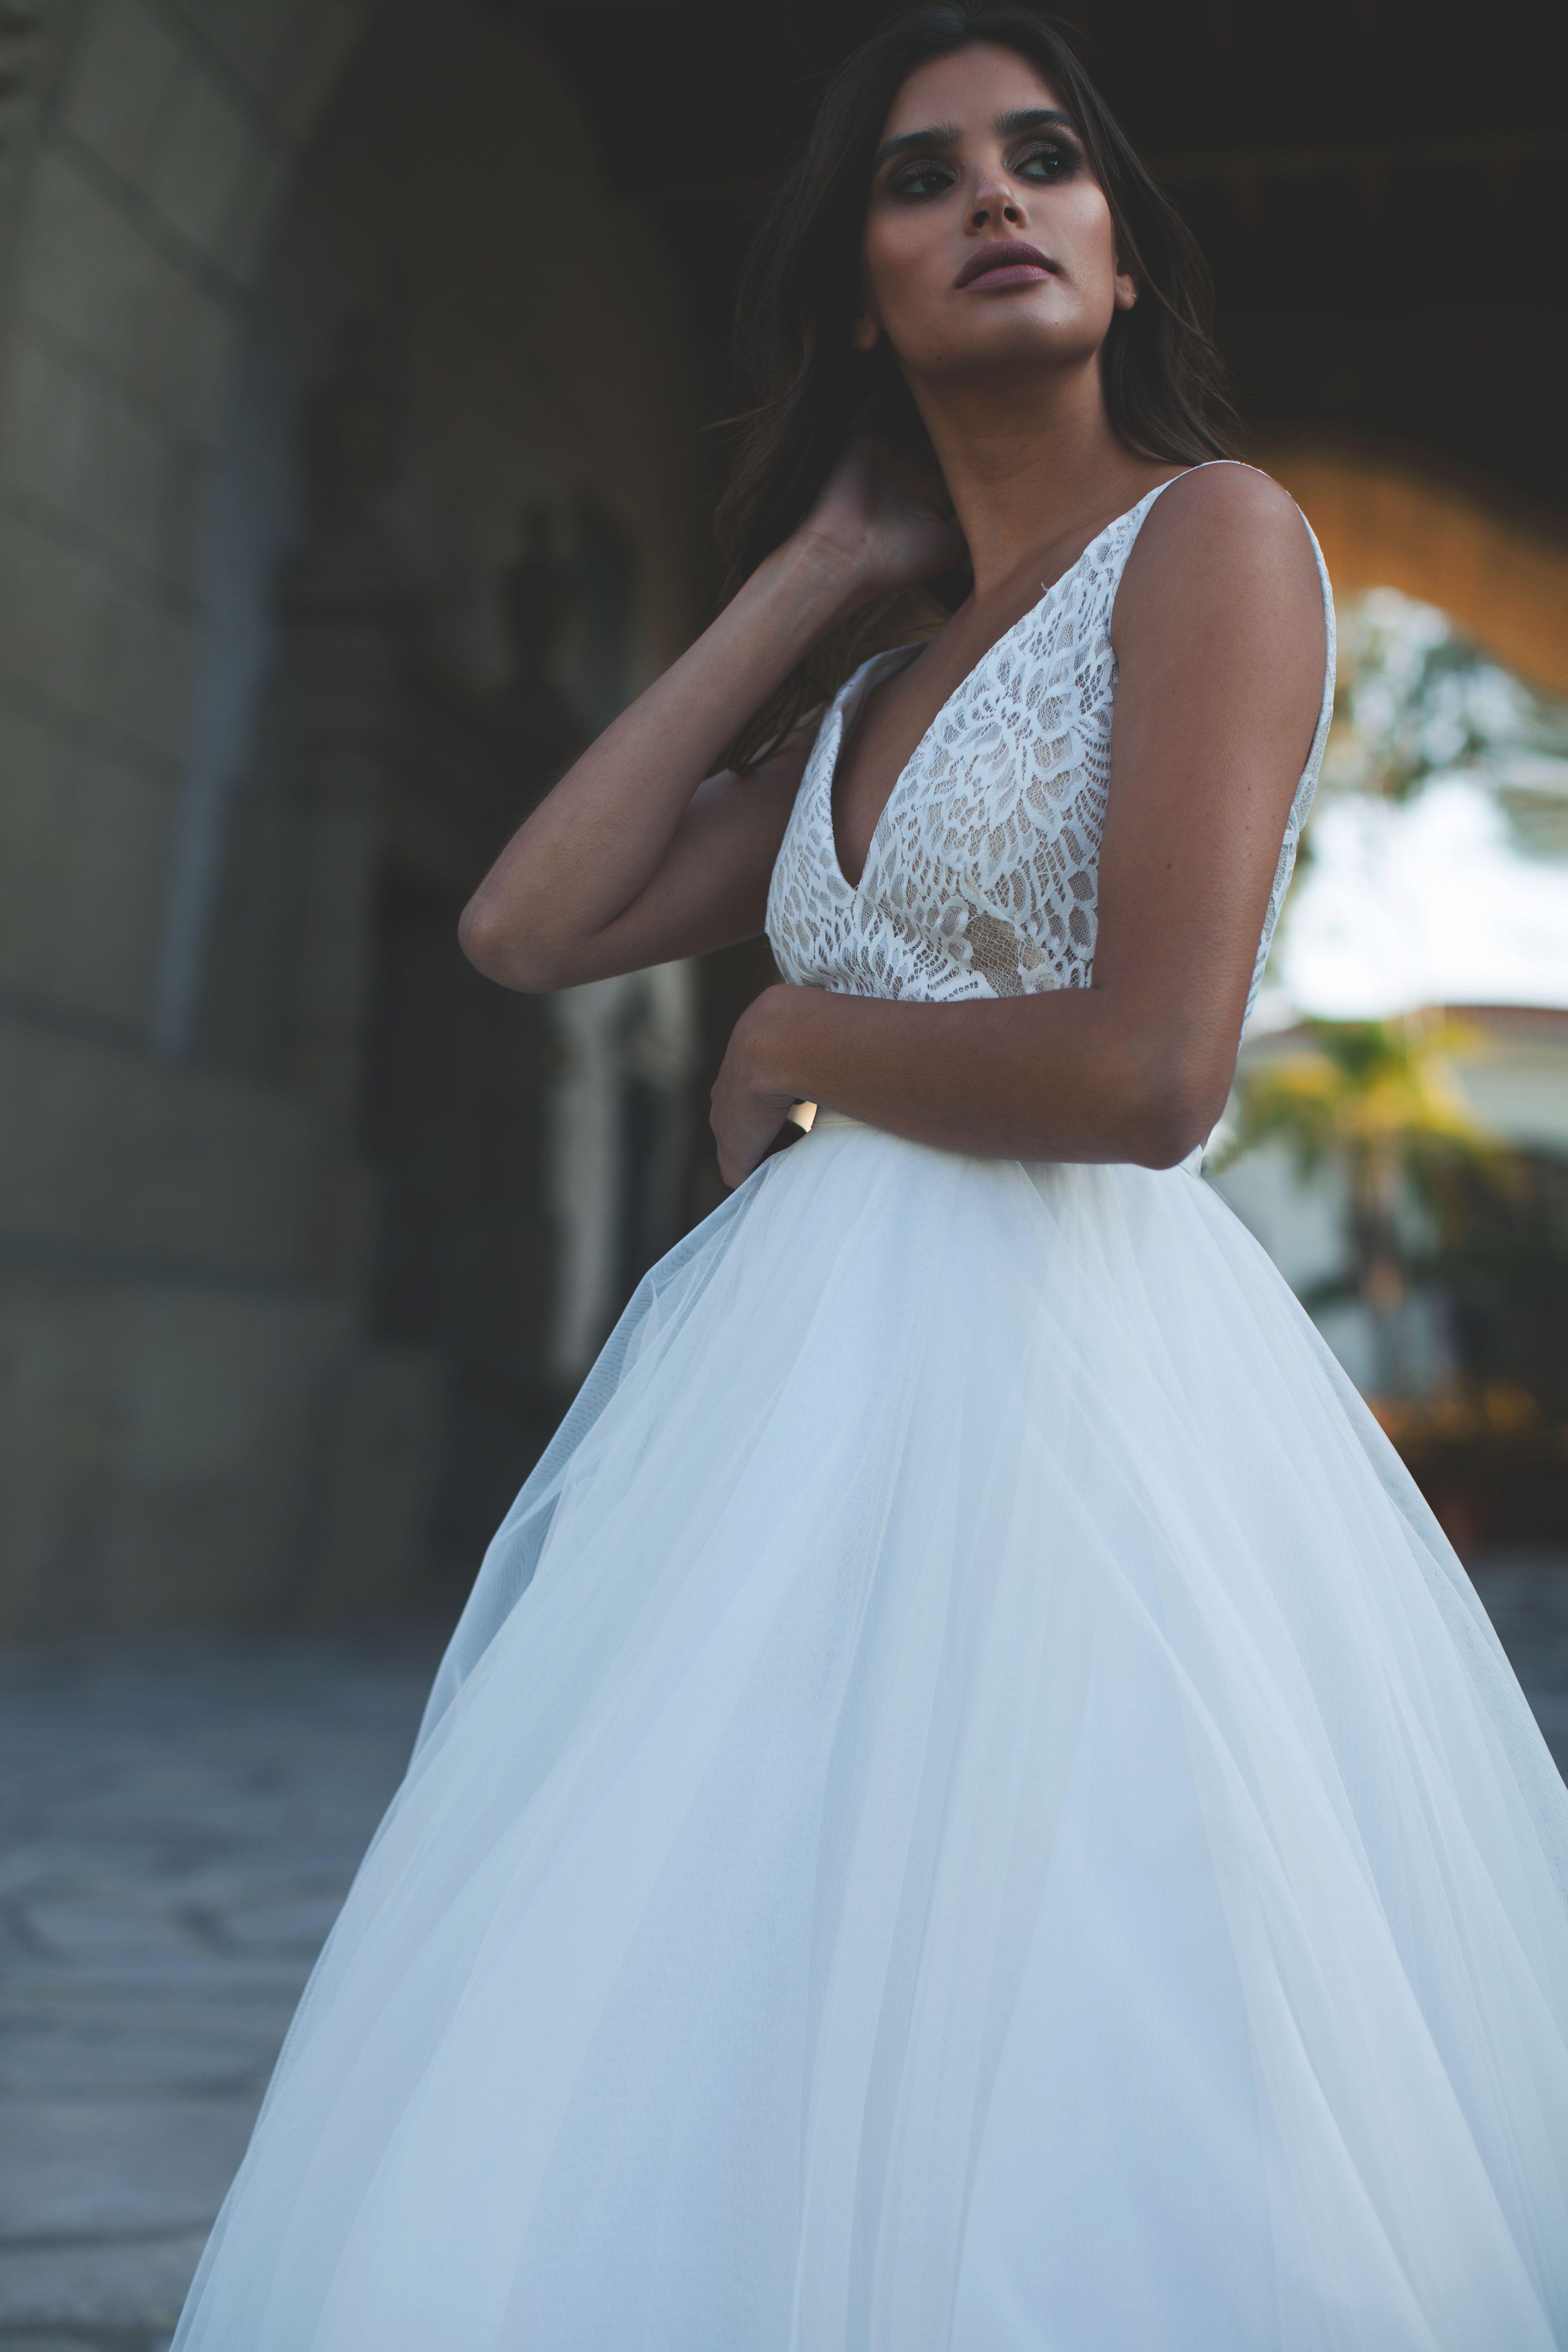 Luxury Taryn Wedding Dress Long Sleeve   Wedding